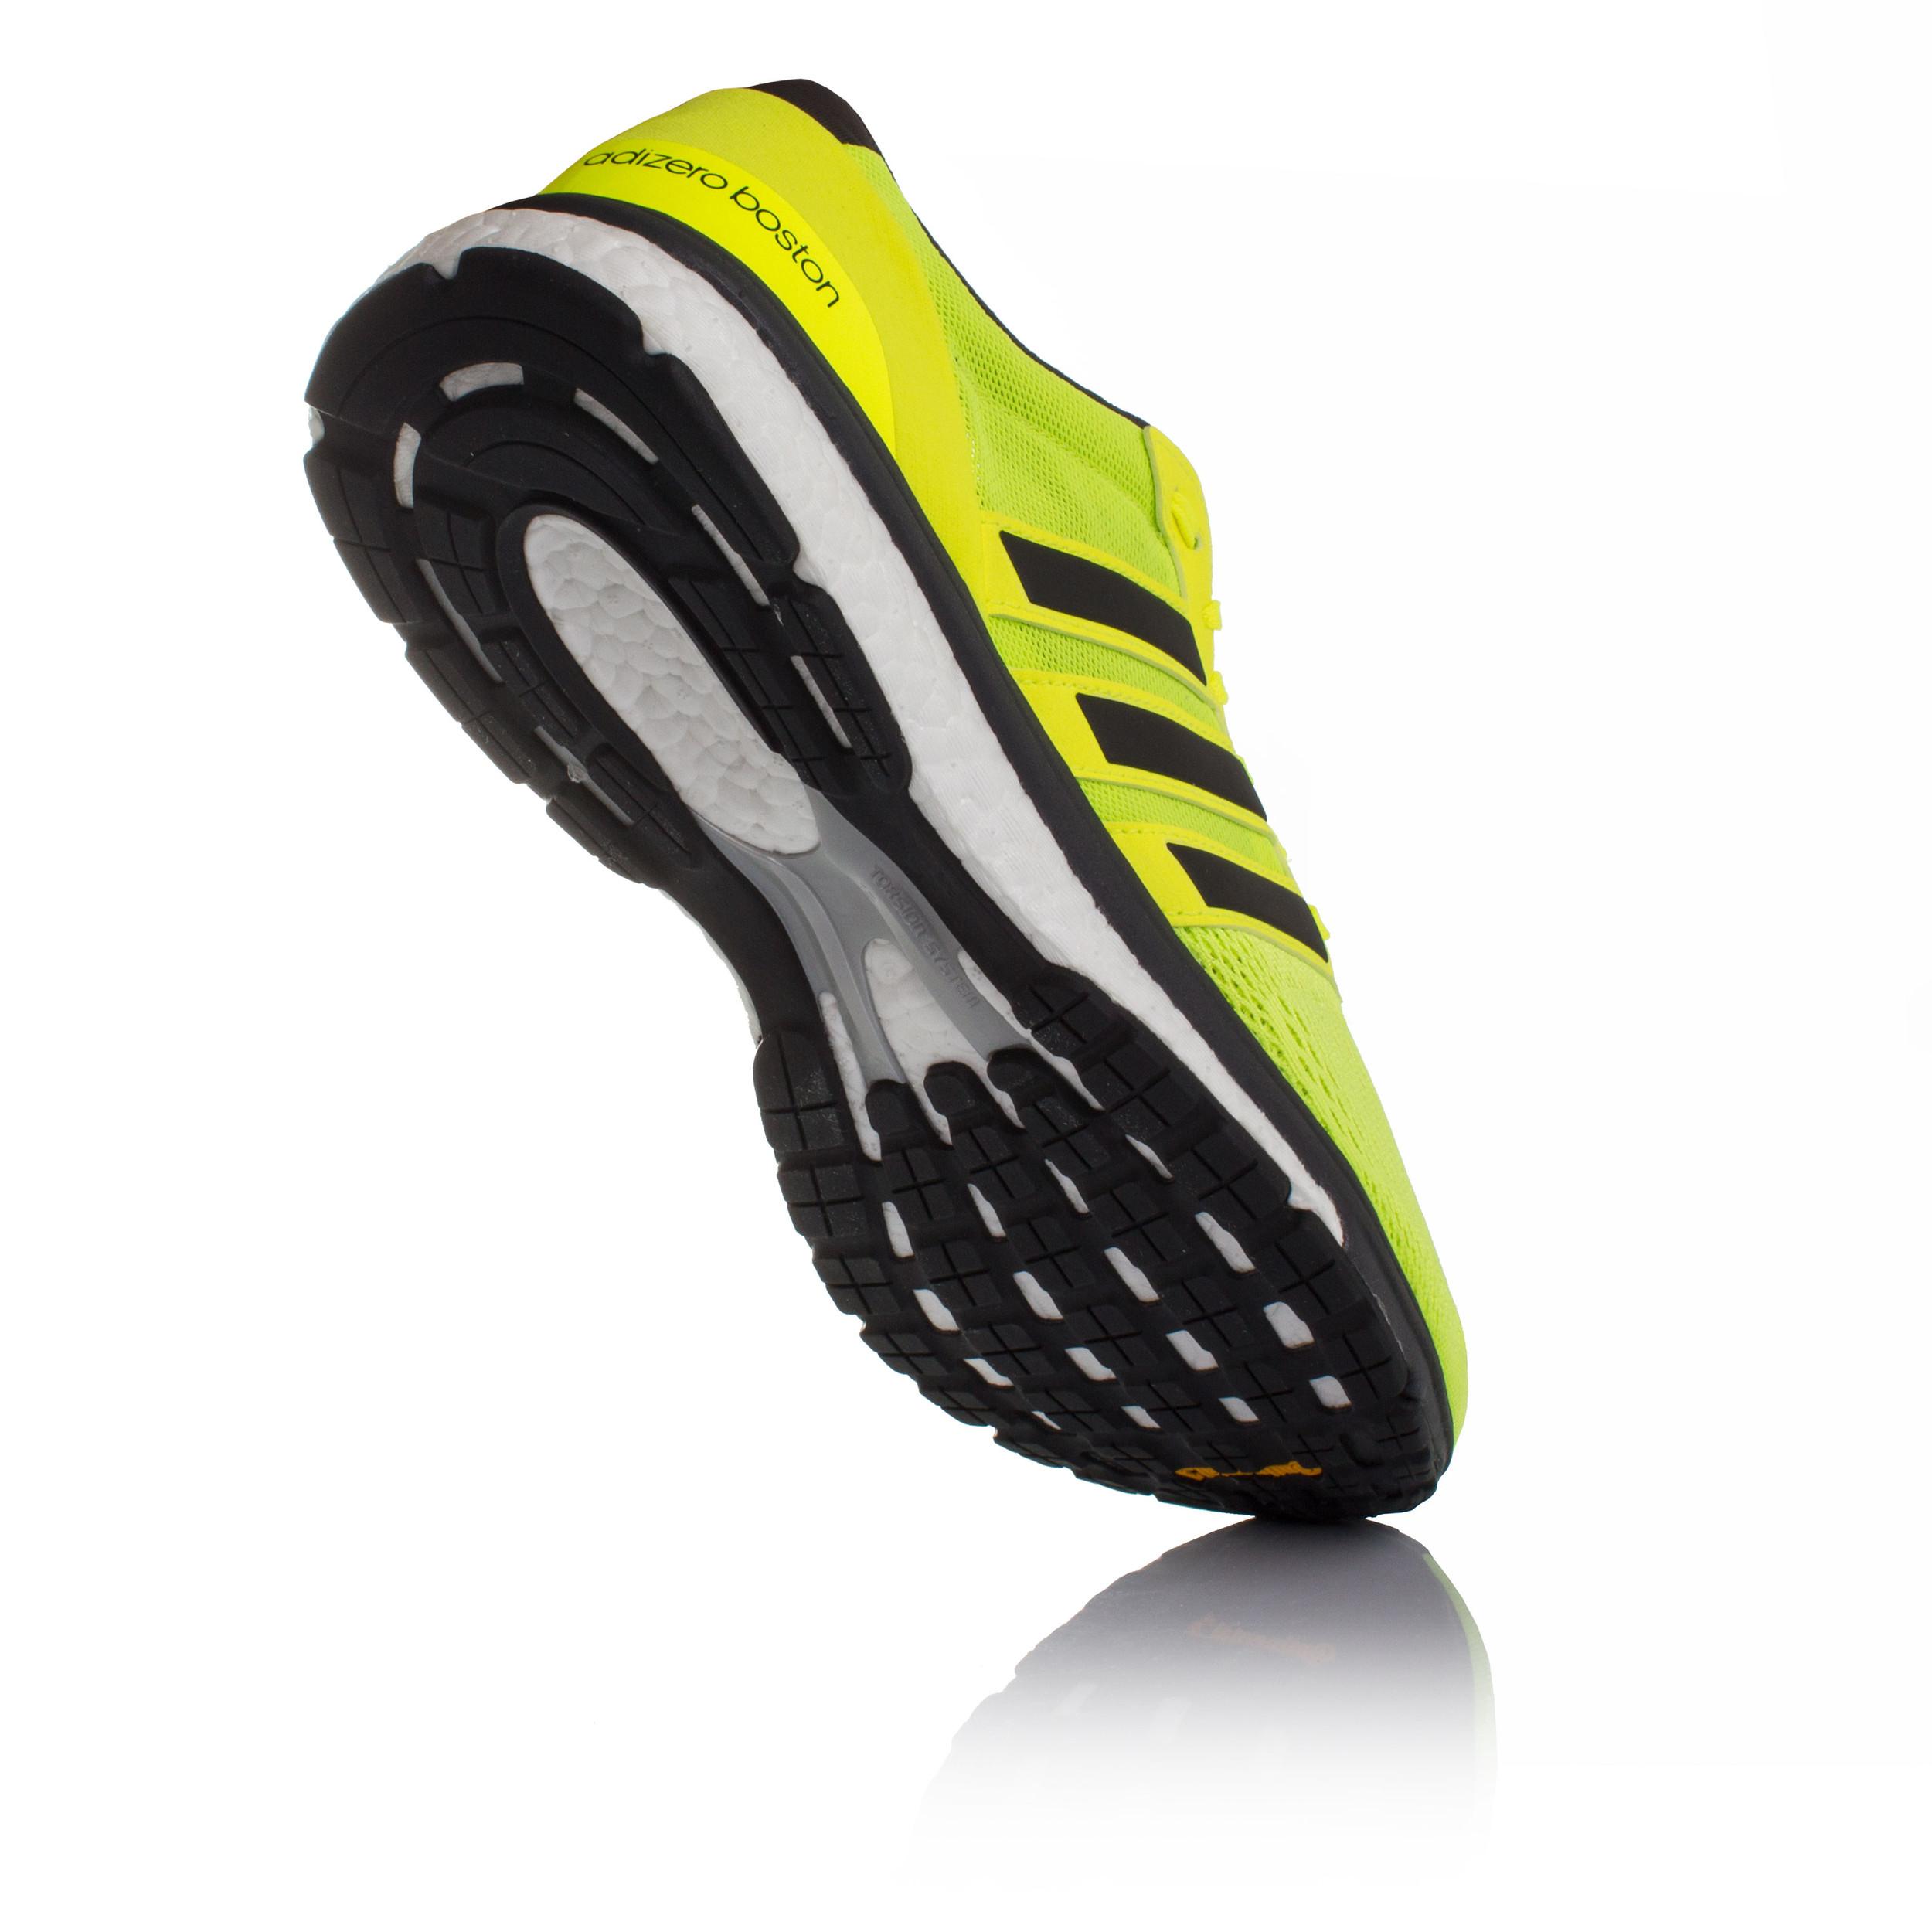 Adidas Adizero Boston 6 Scarpa Da Corsa - Uomo viJKtF